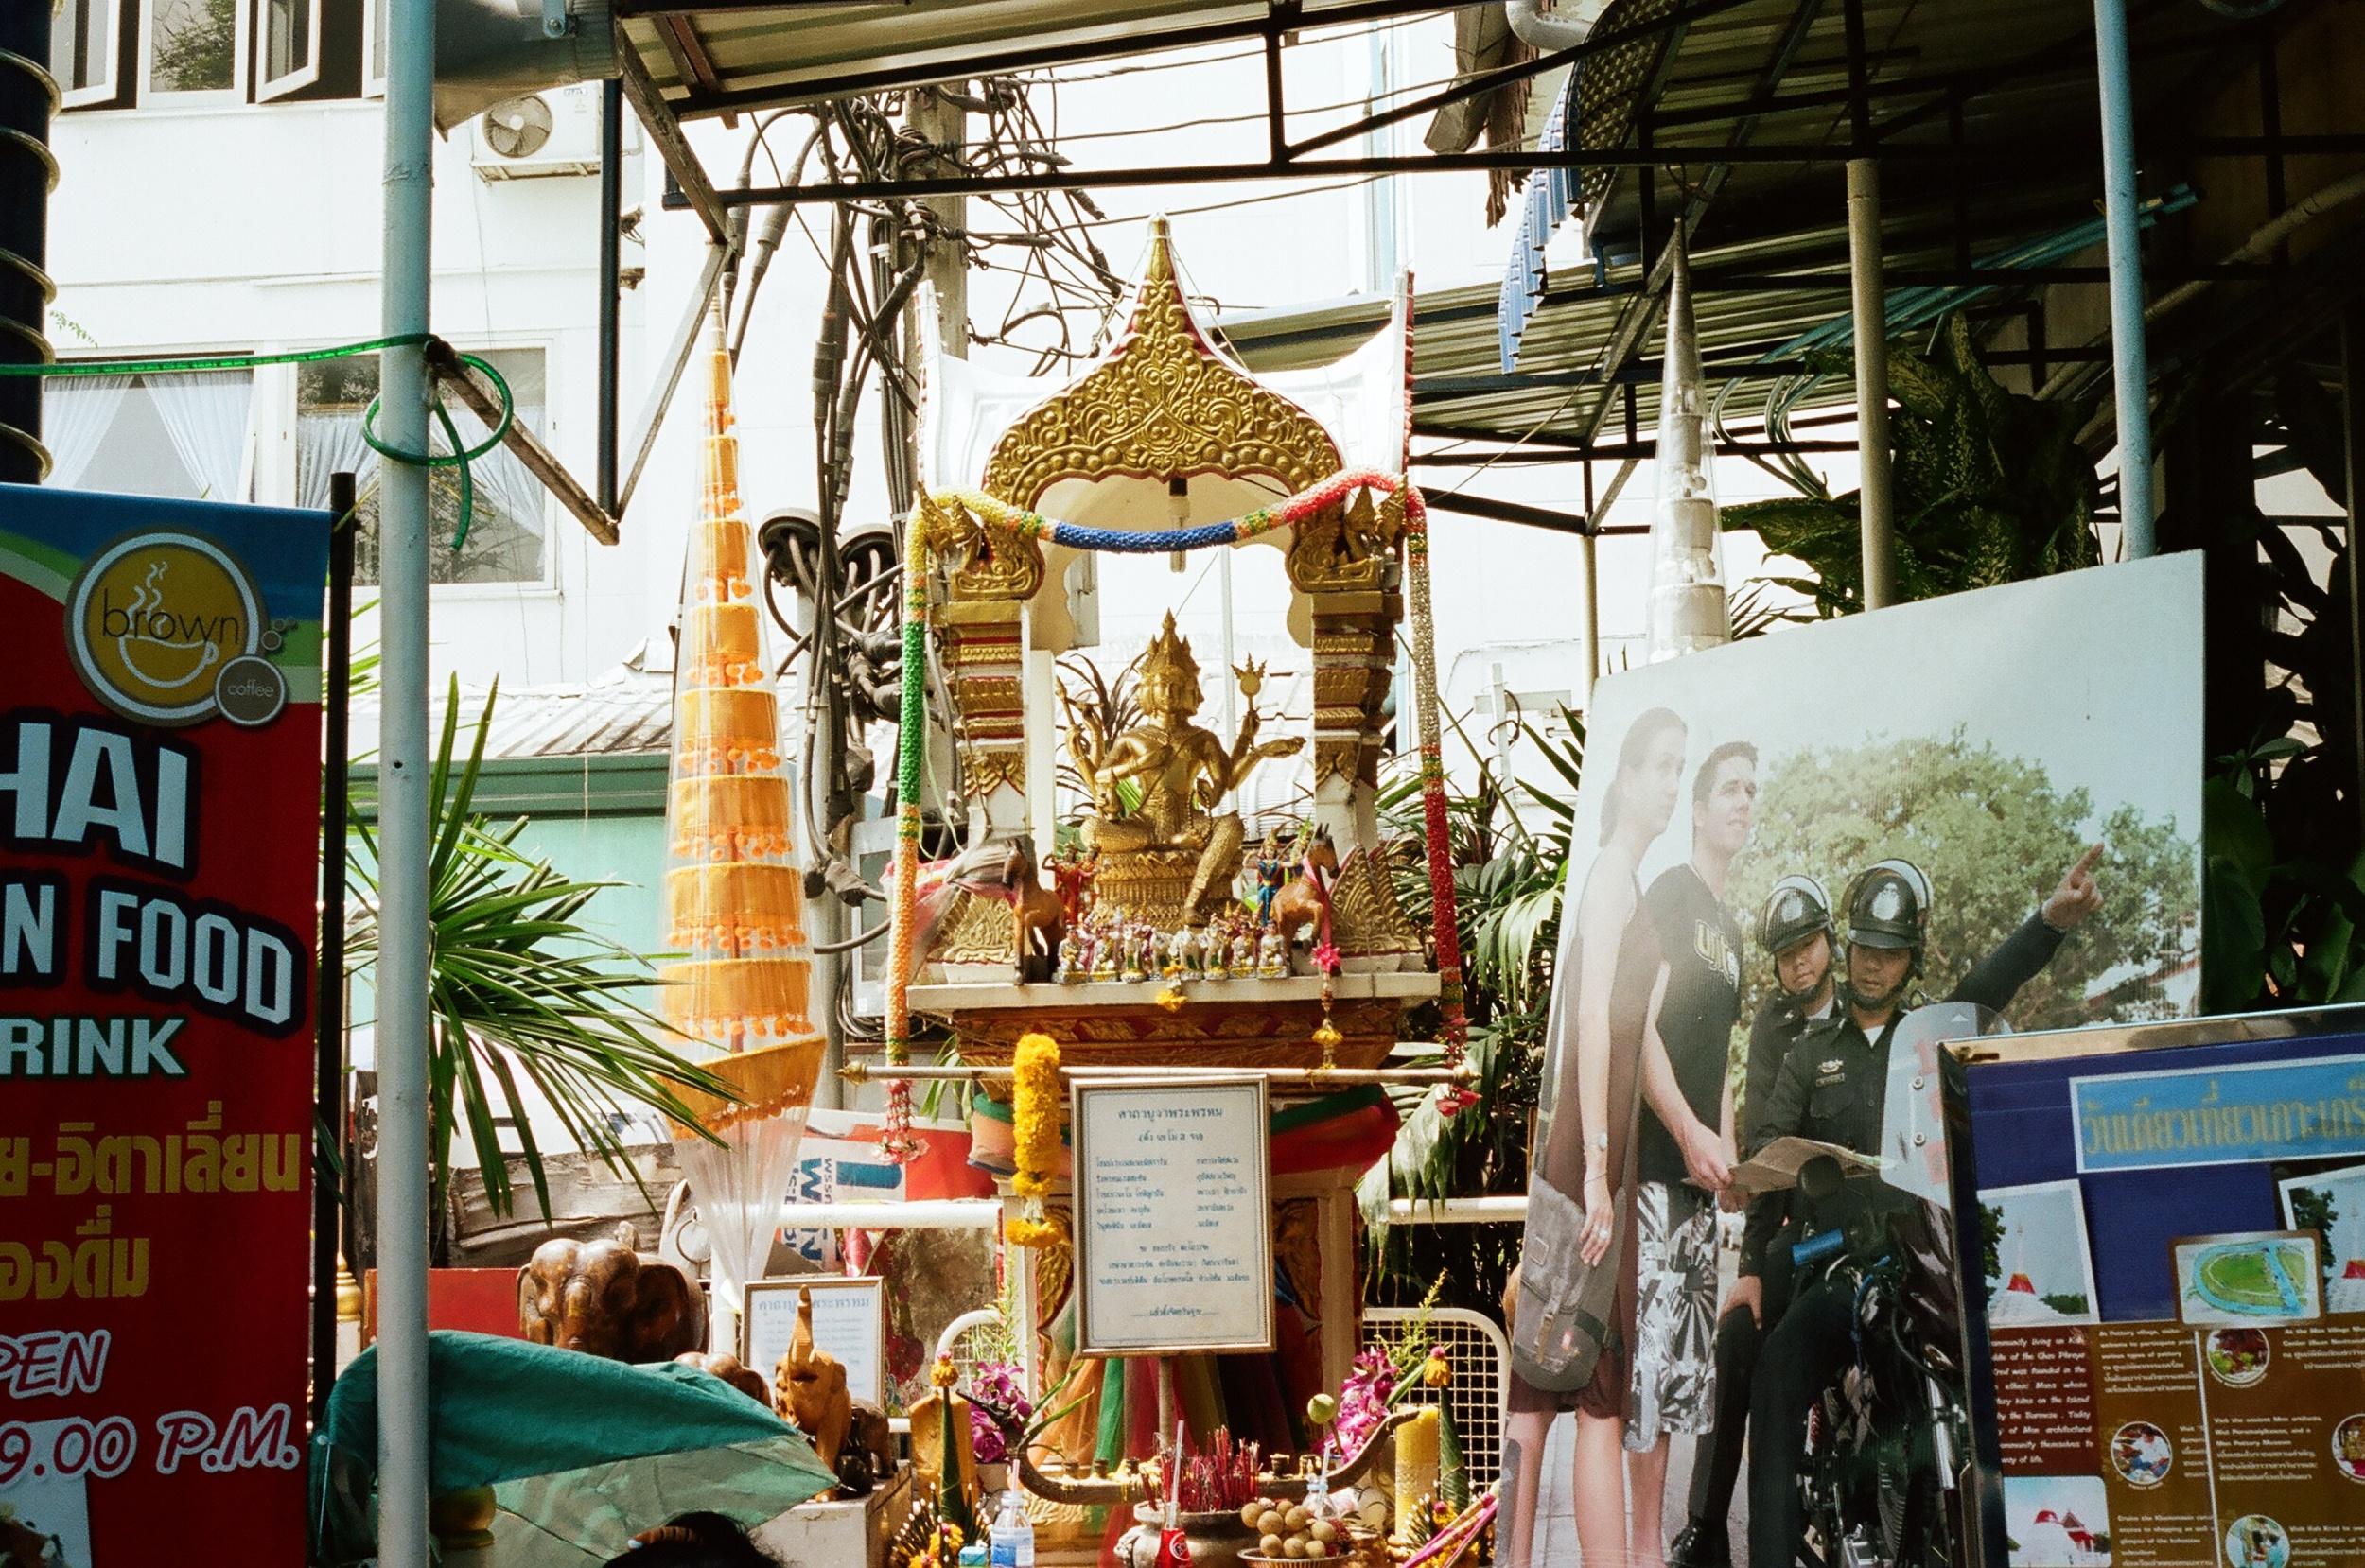 Shrines everywhere, so beautiful